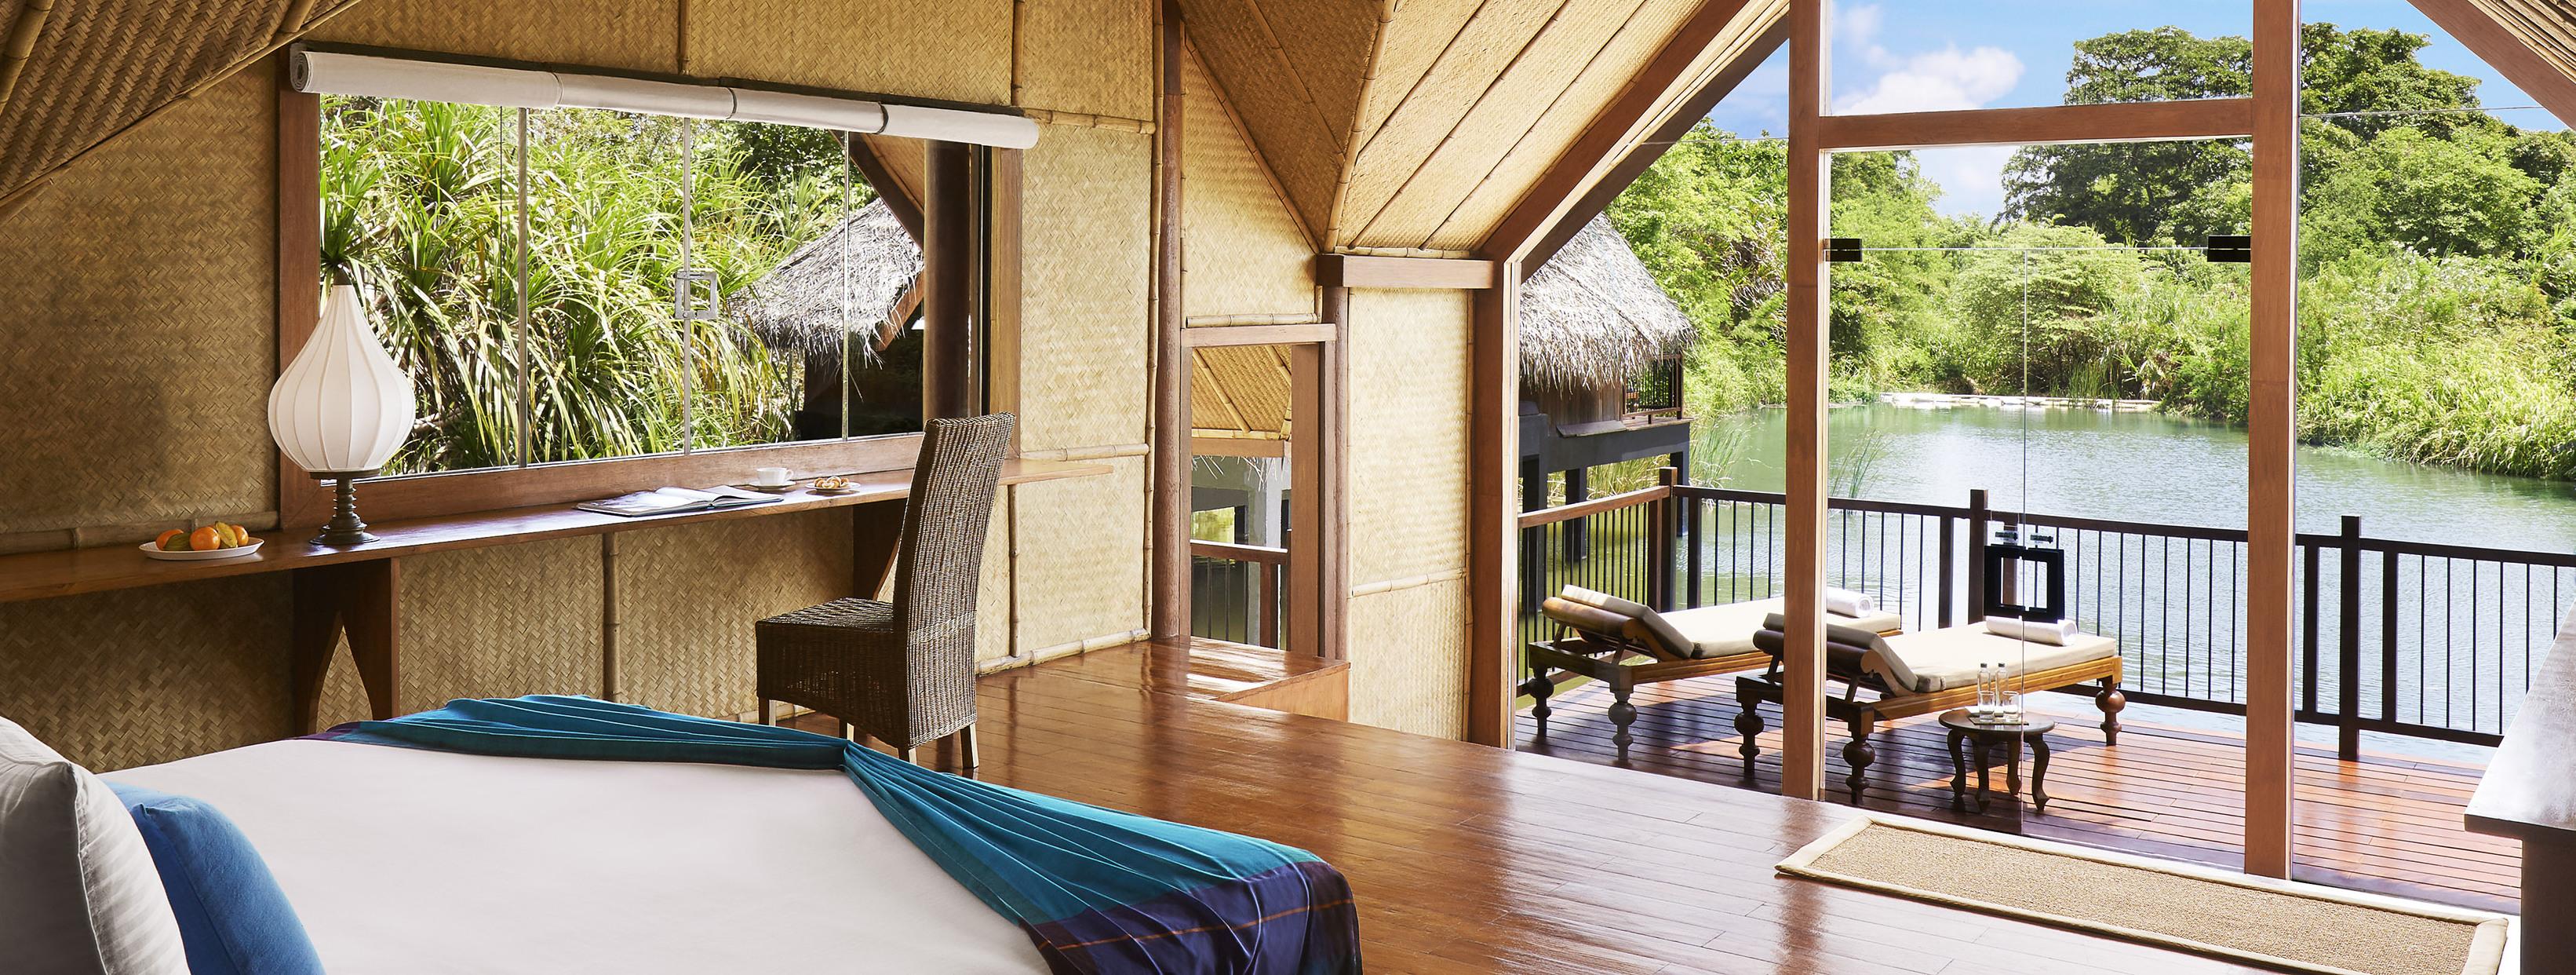 tailor-made-vacations-sri-lanka